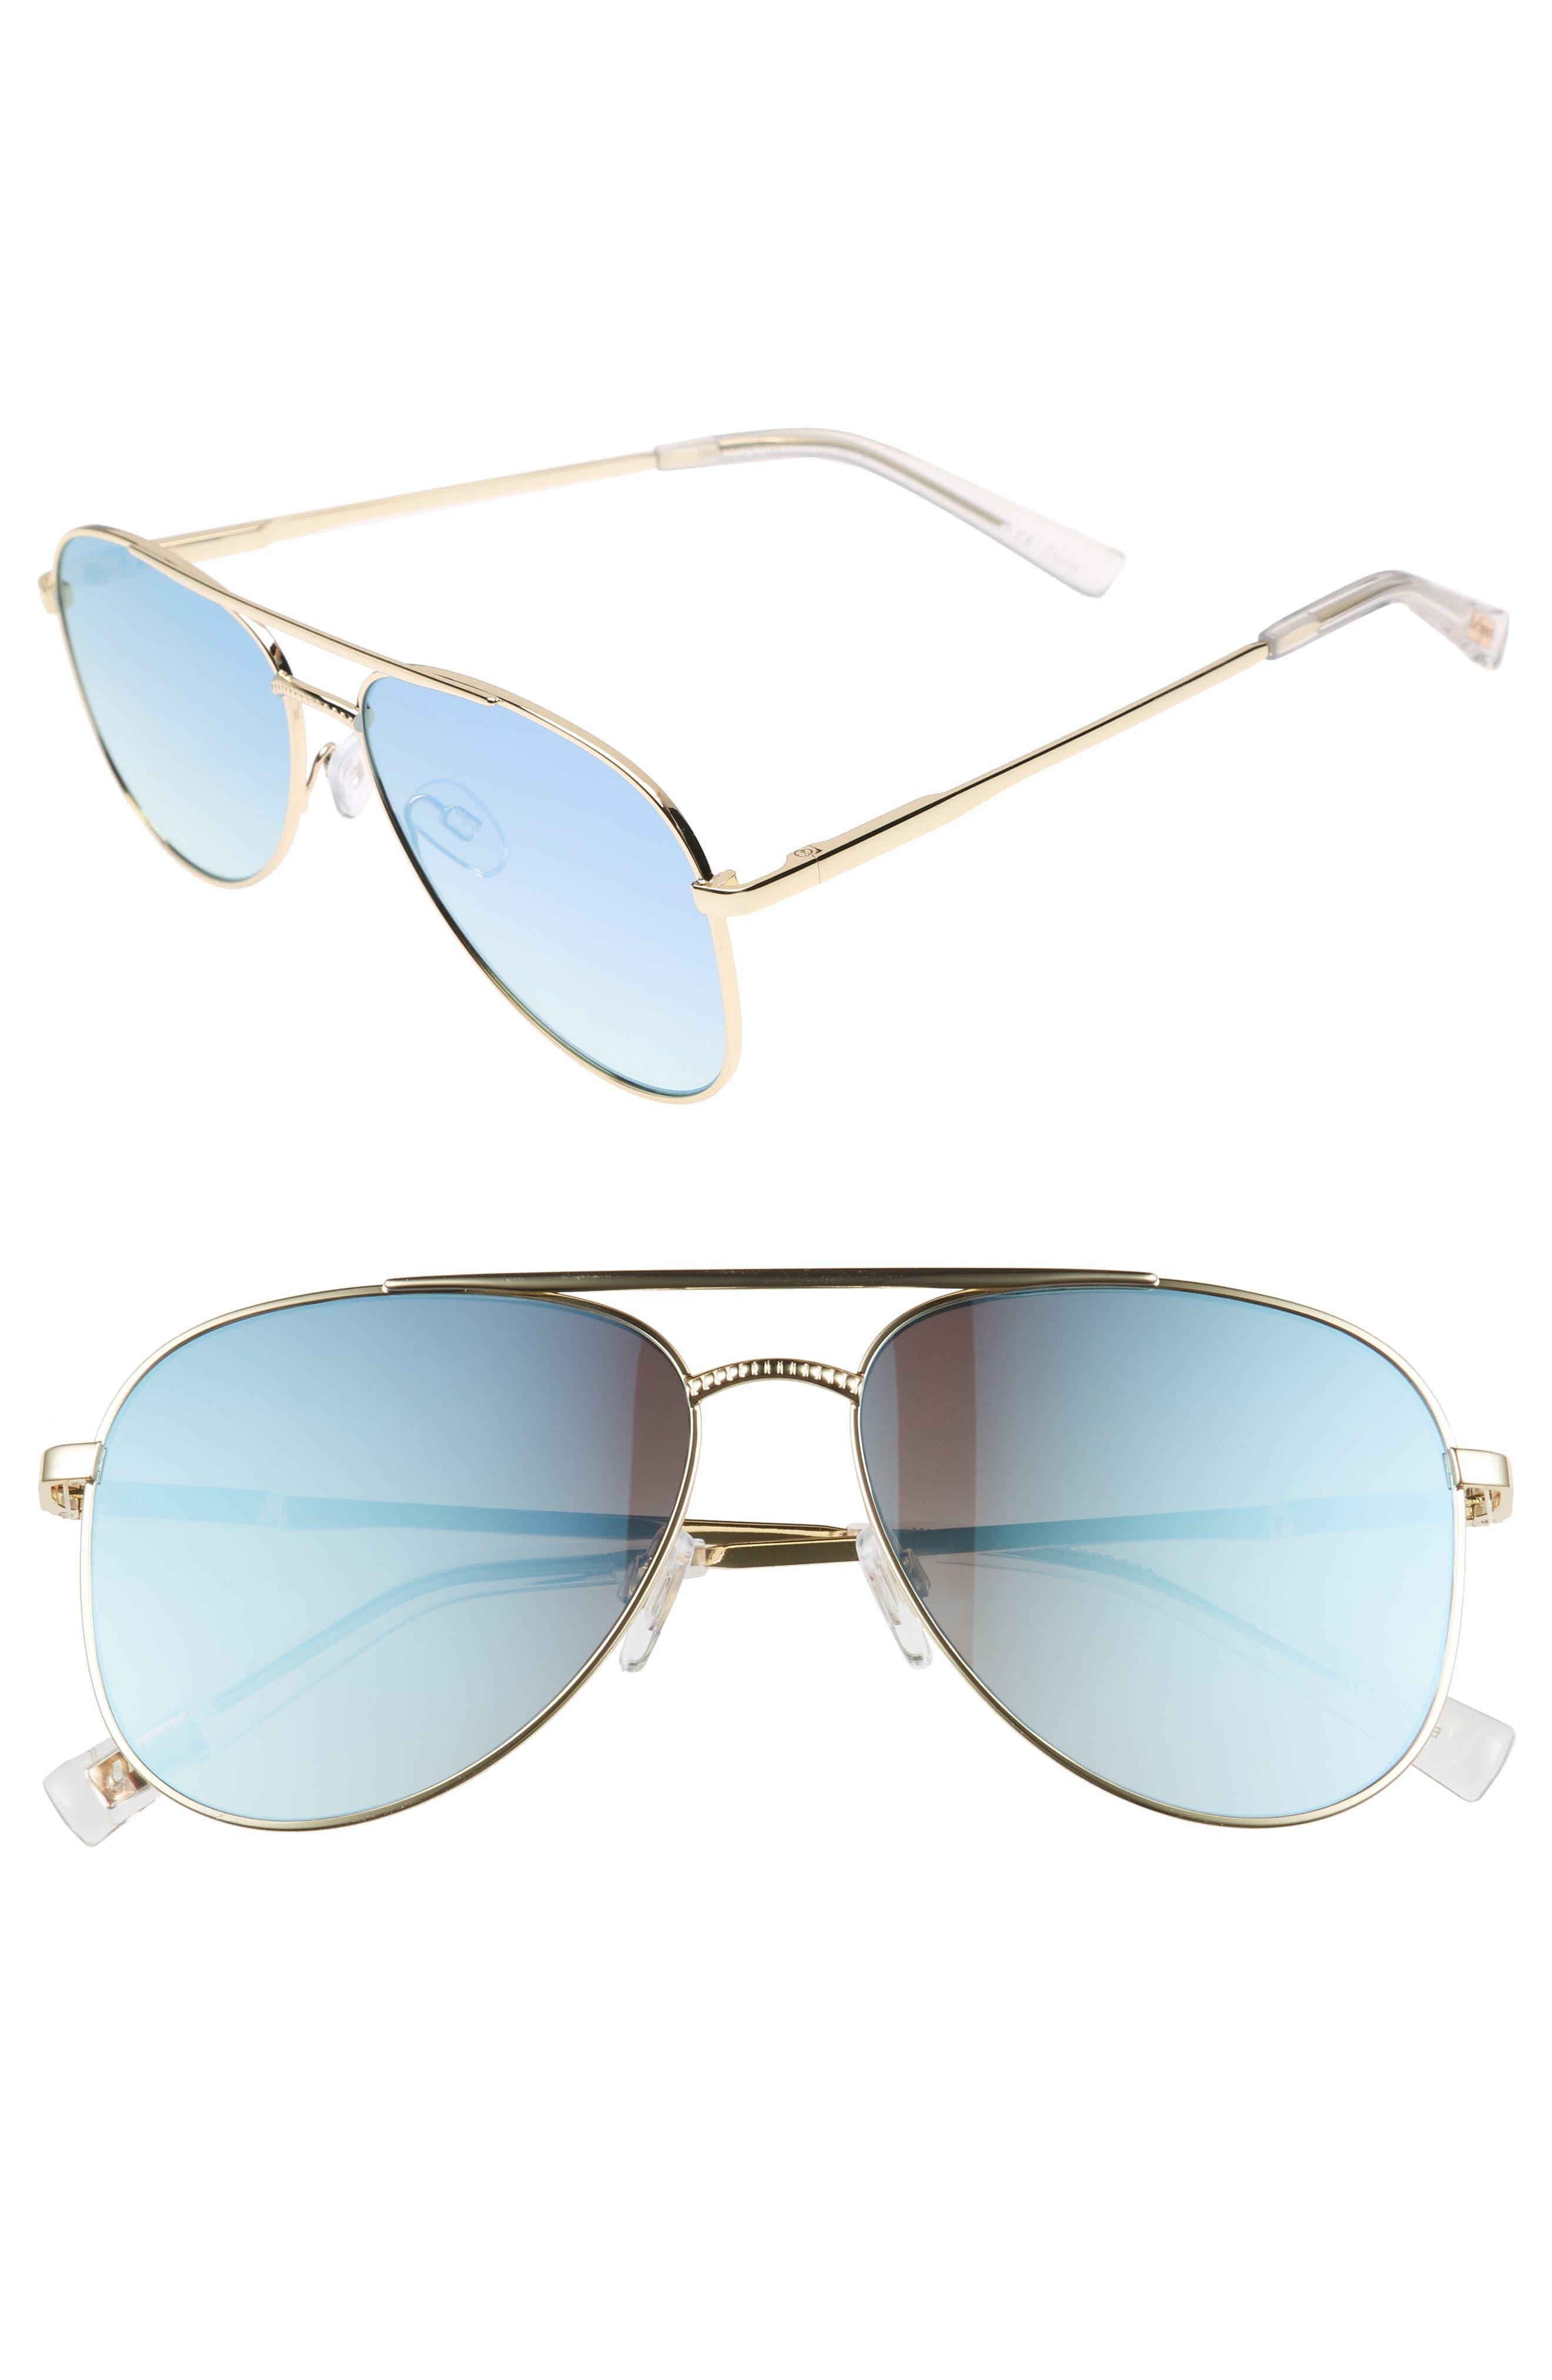 Kingdom 57mm Polarized Aviator Sunglasses,                         Main,                         color, Bright Gold